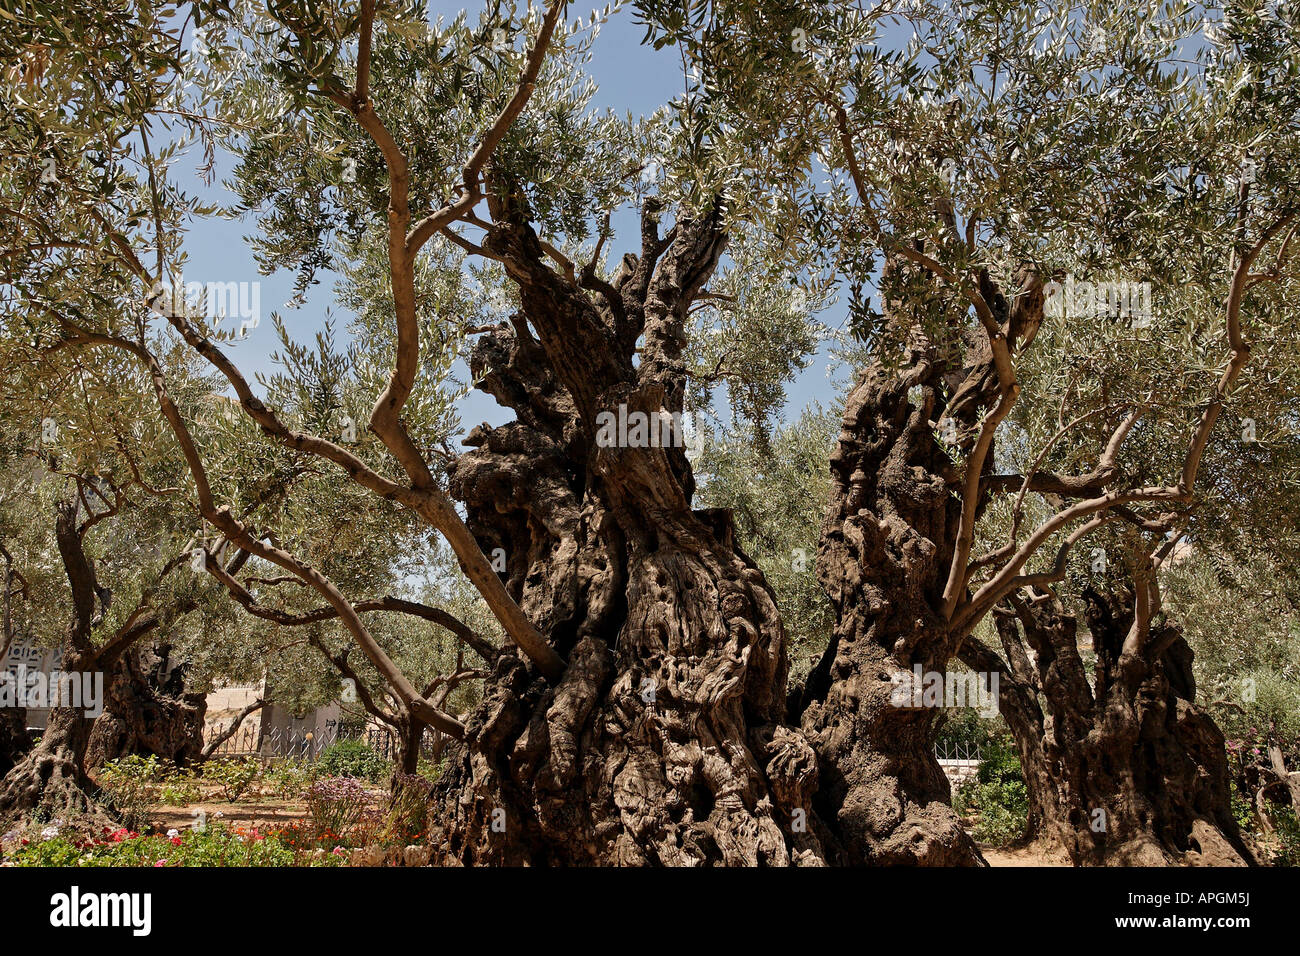 Garden Gethsemane Stock Photos & Garden Gethsemane Stock Images - Alamy